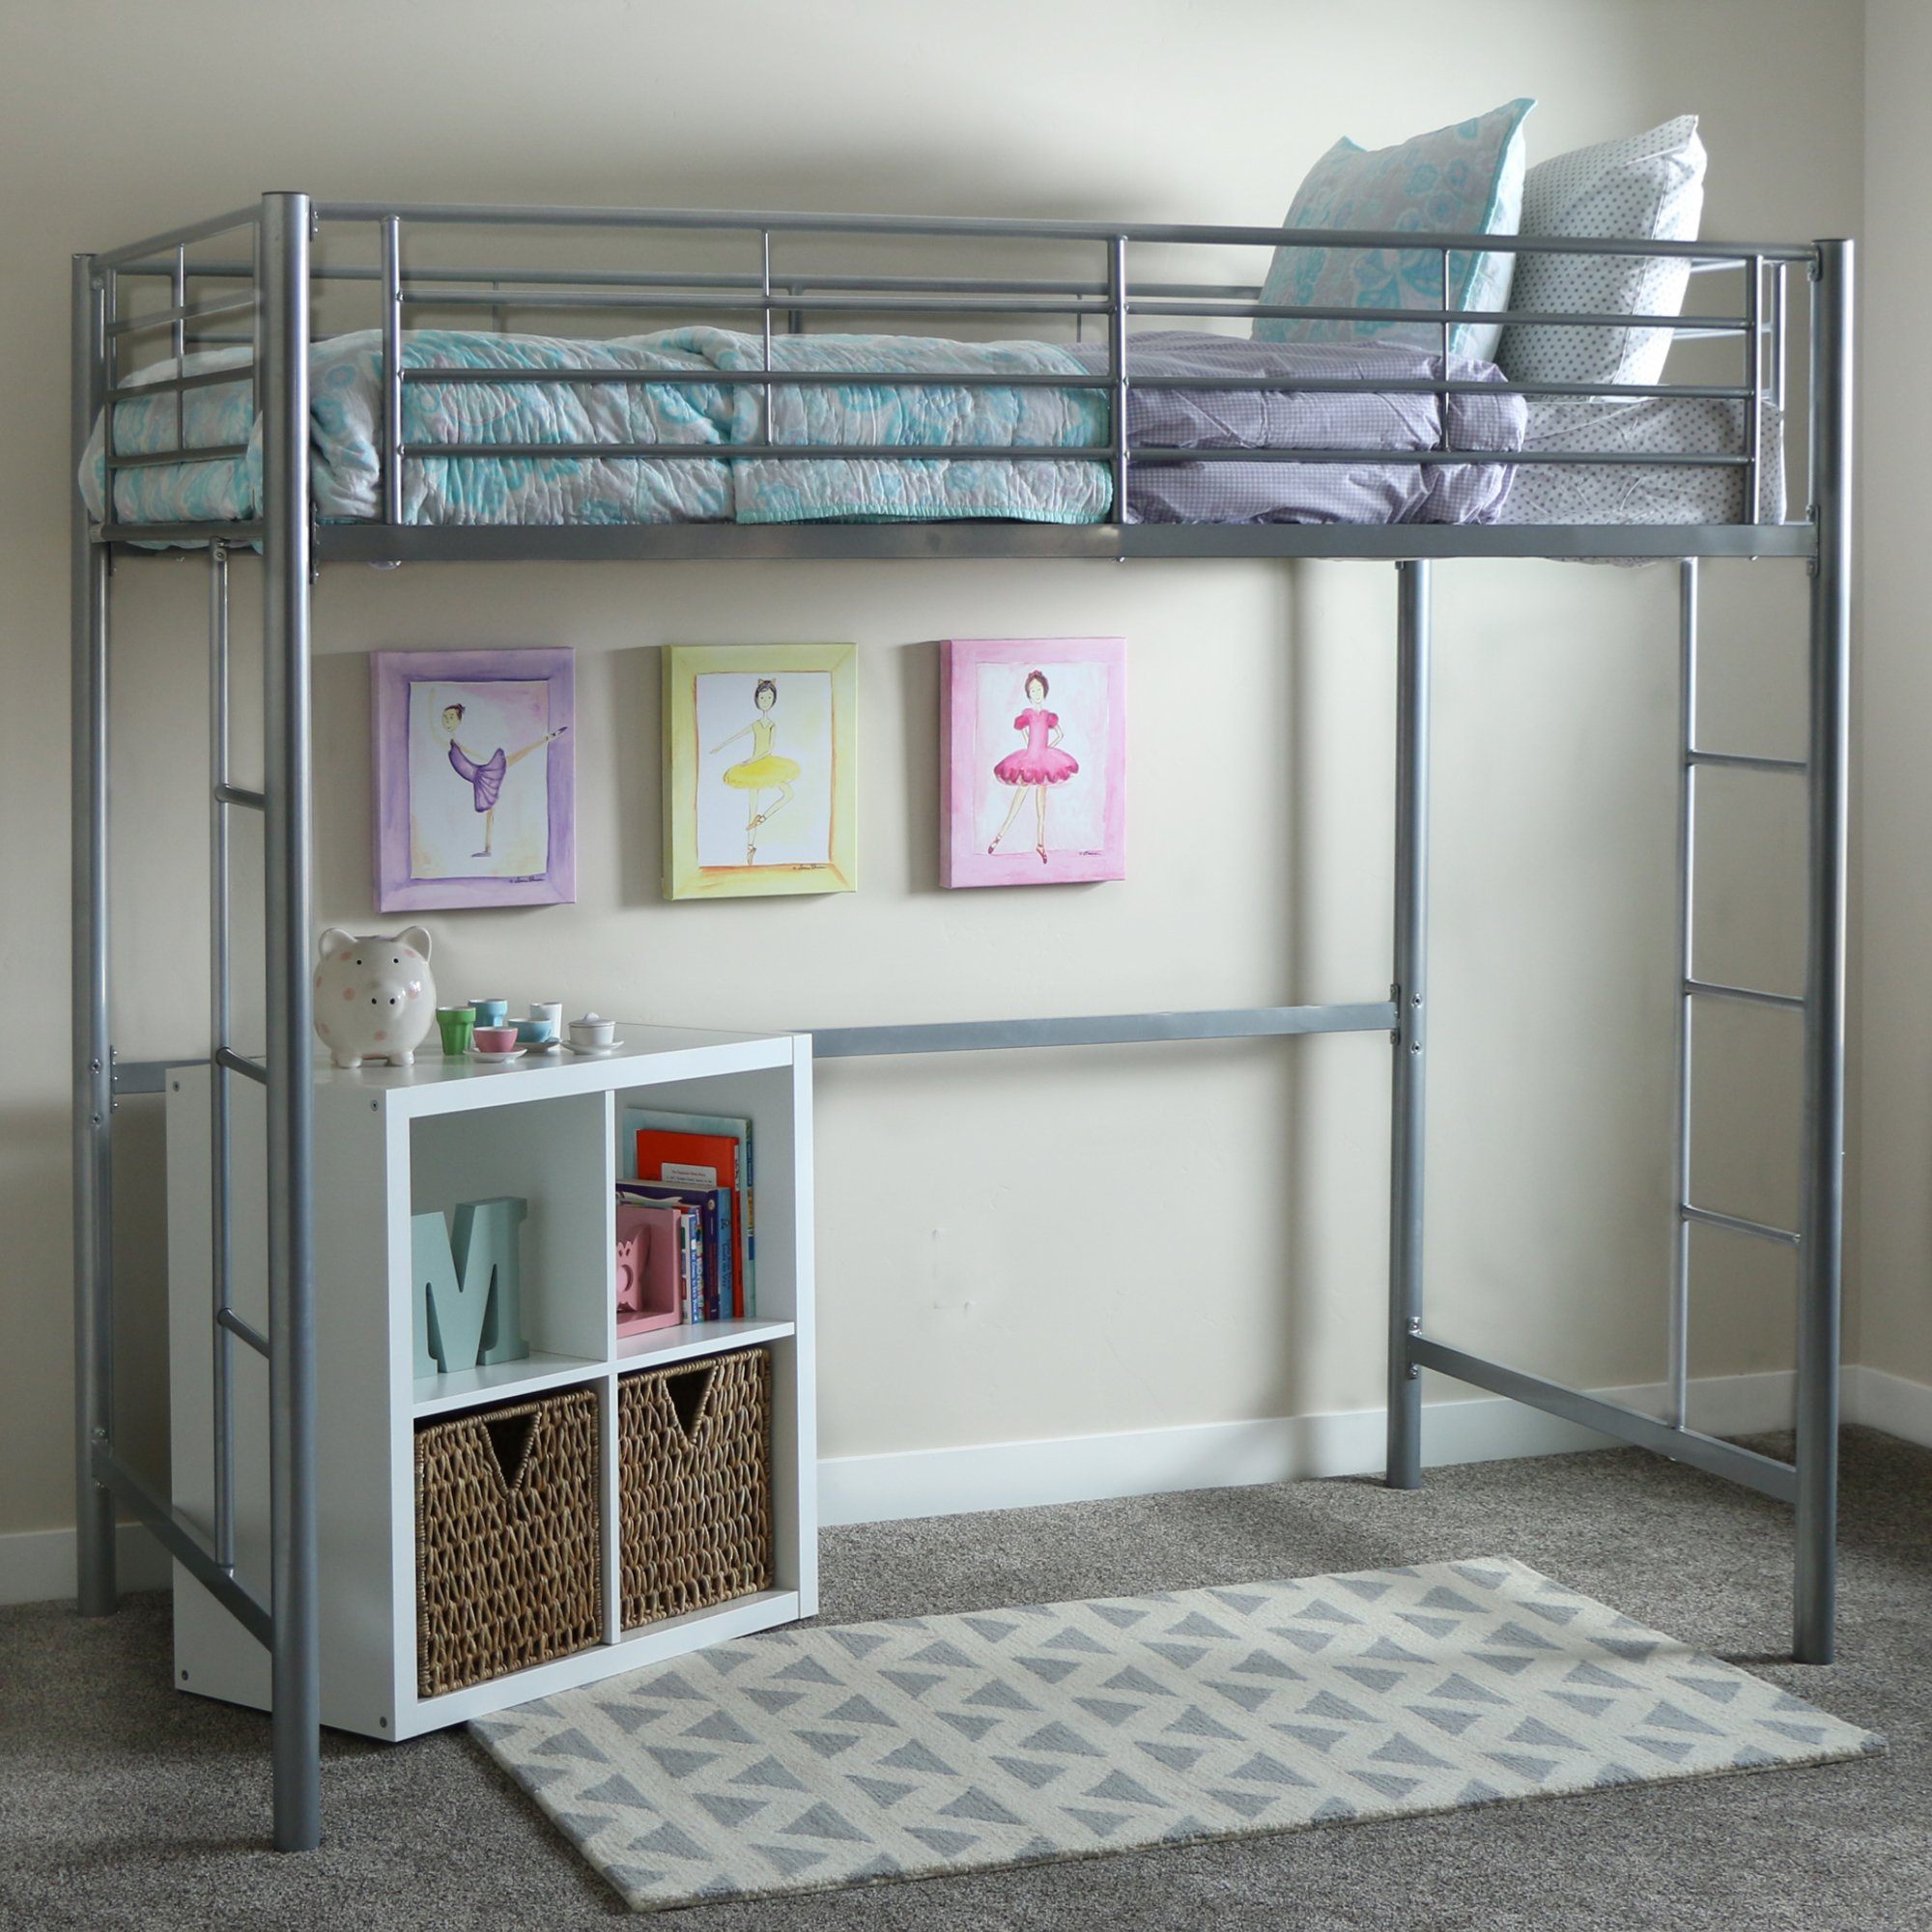 WE Furniture AZTOLSL Grey loft Bed, 71'' x 42'' x 79'', Silver